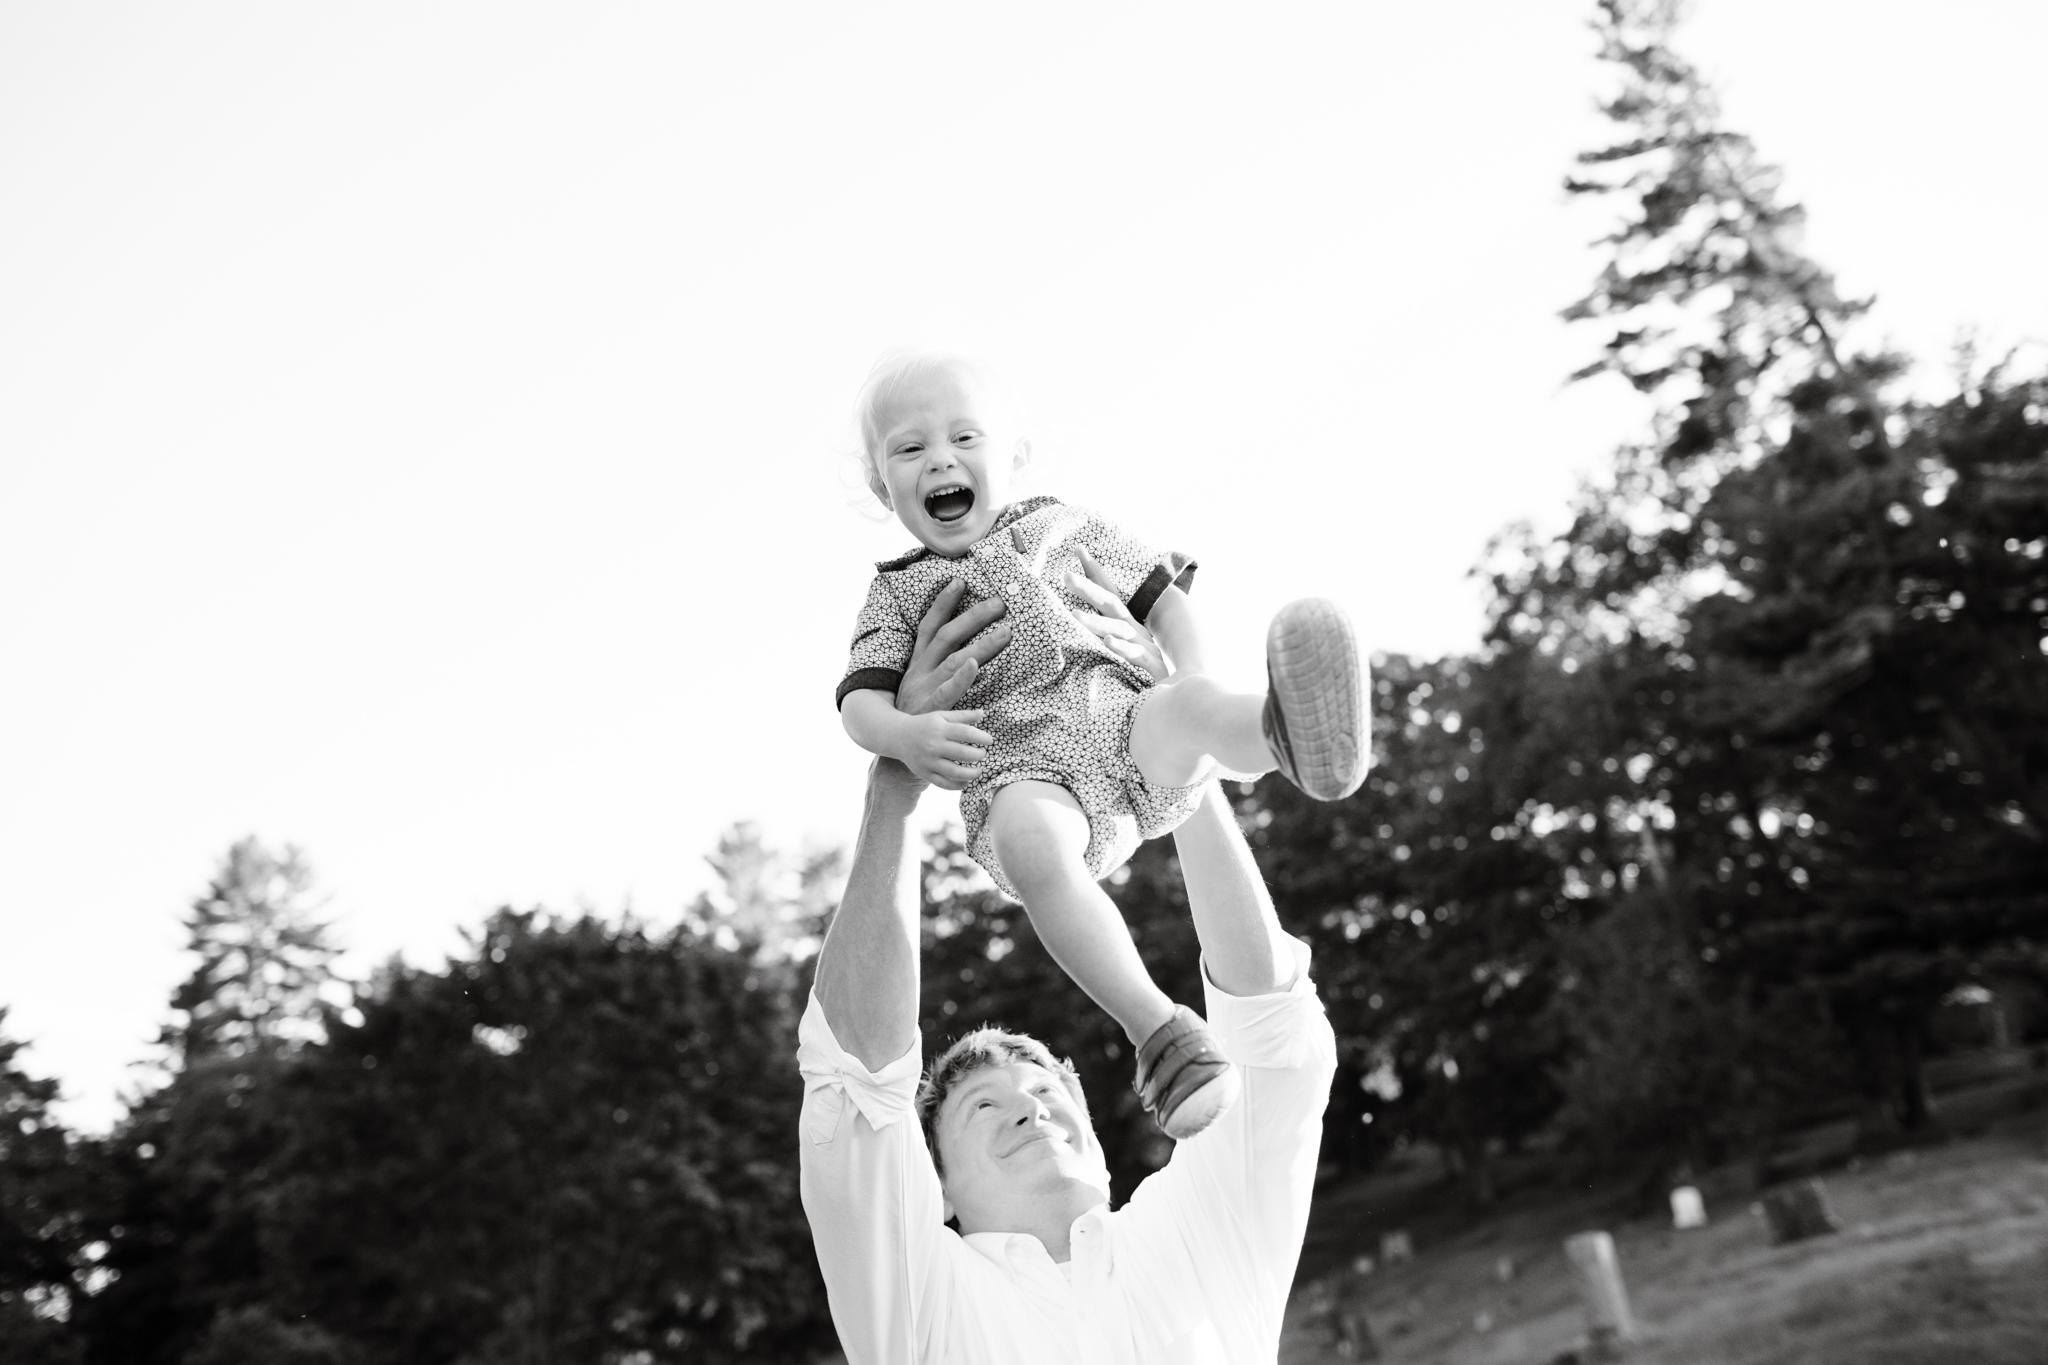 maine-maternity-photographer-stepheneycollins -71.jpg